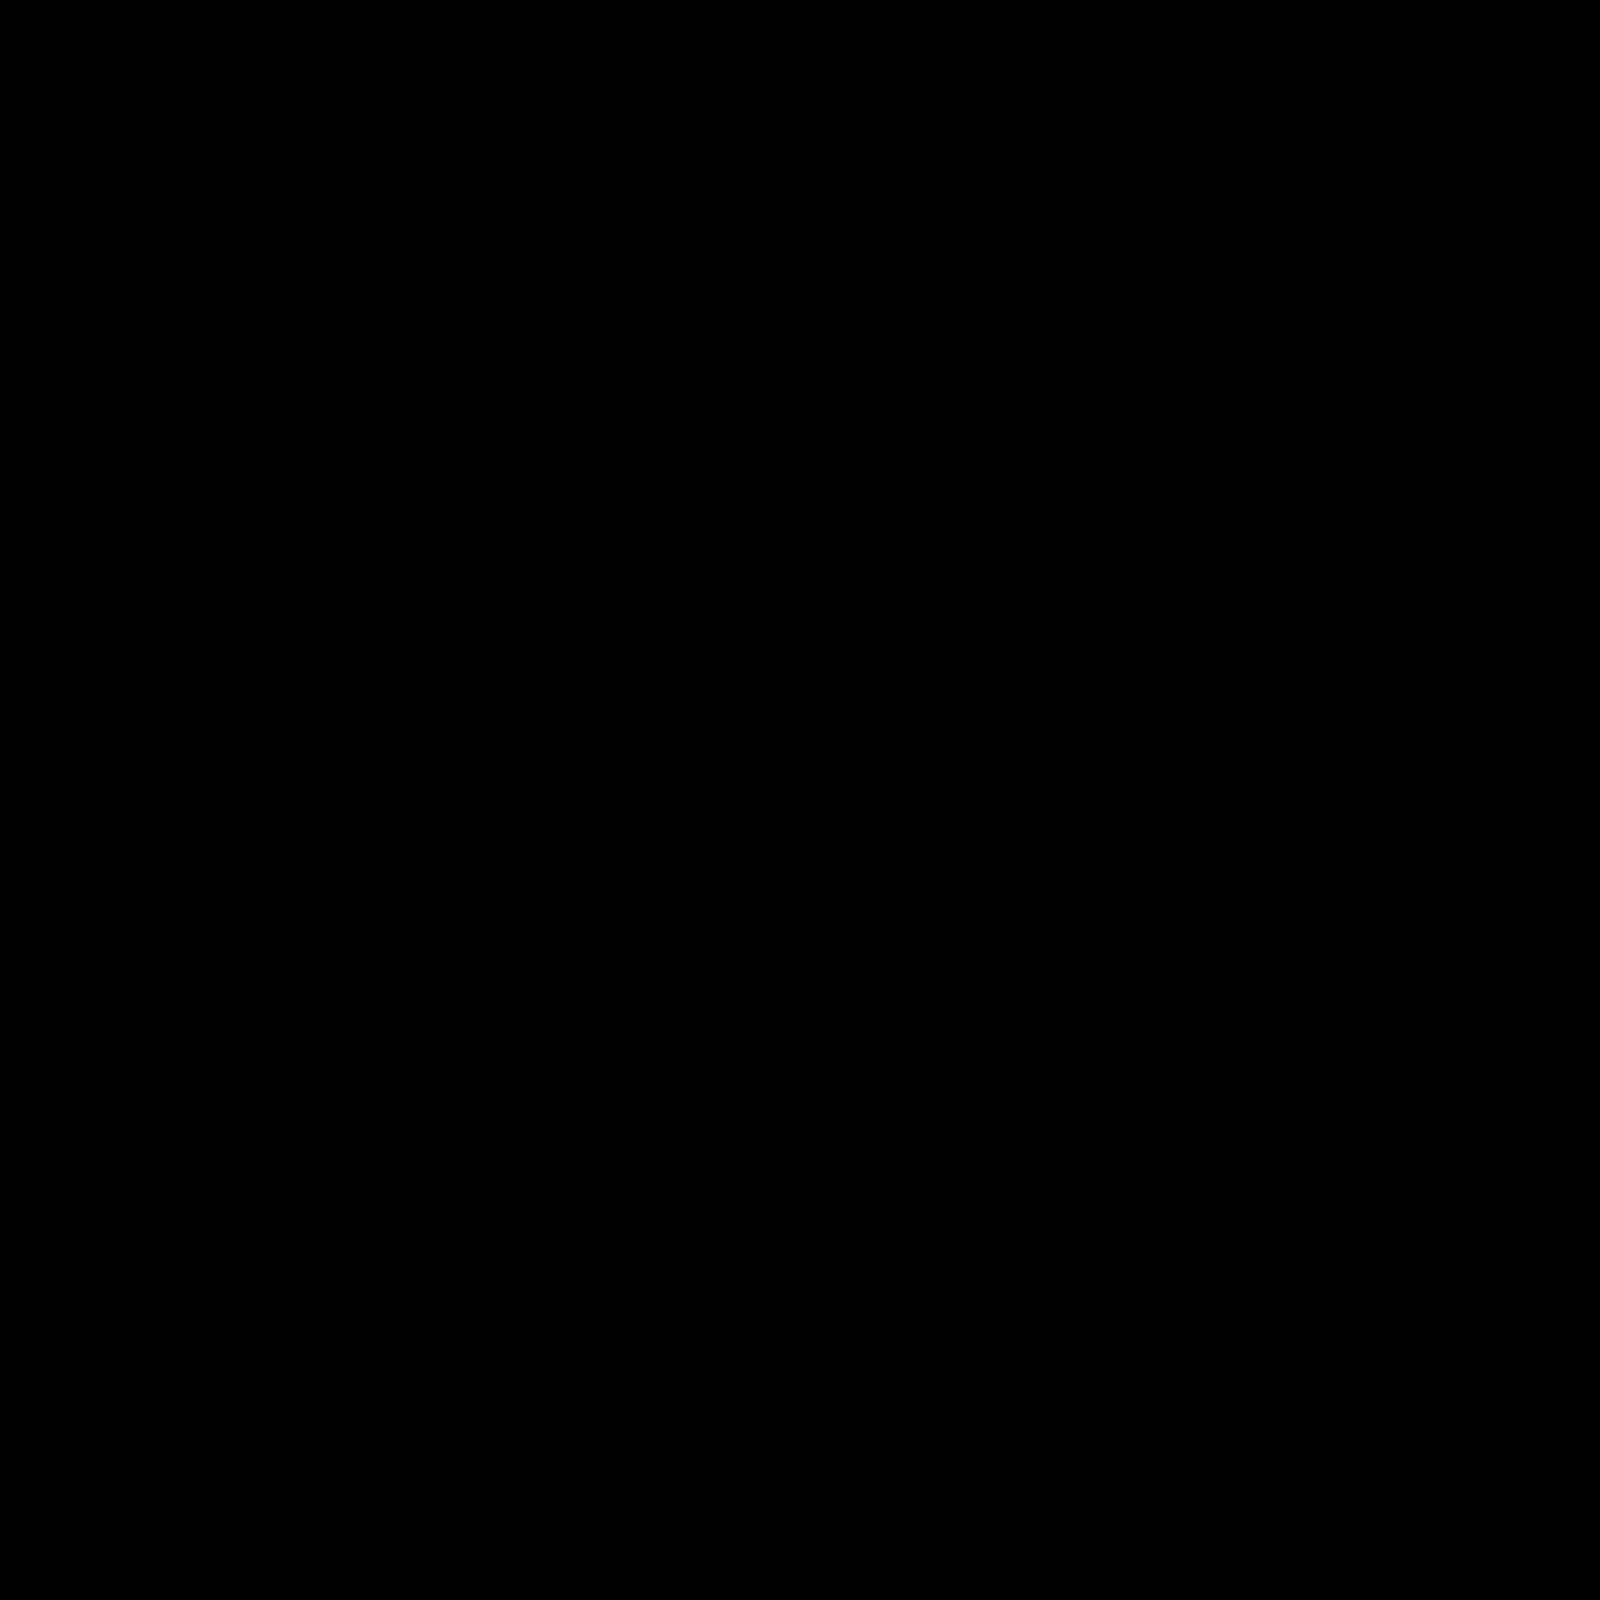 Prawo Book icon